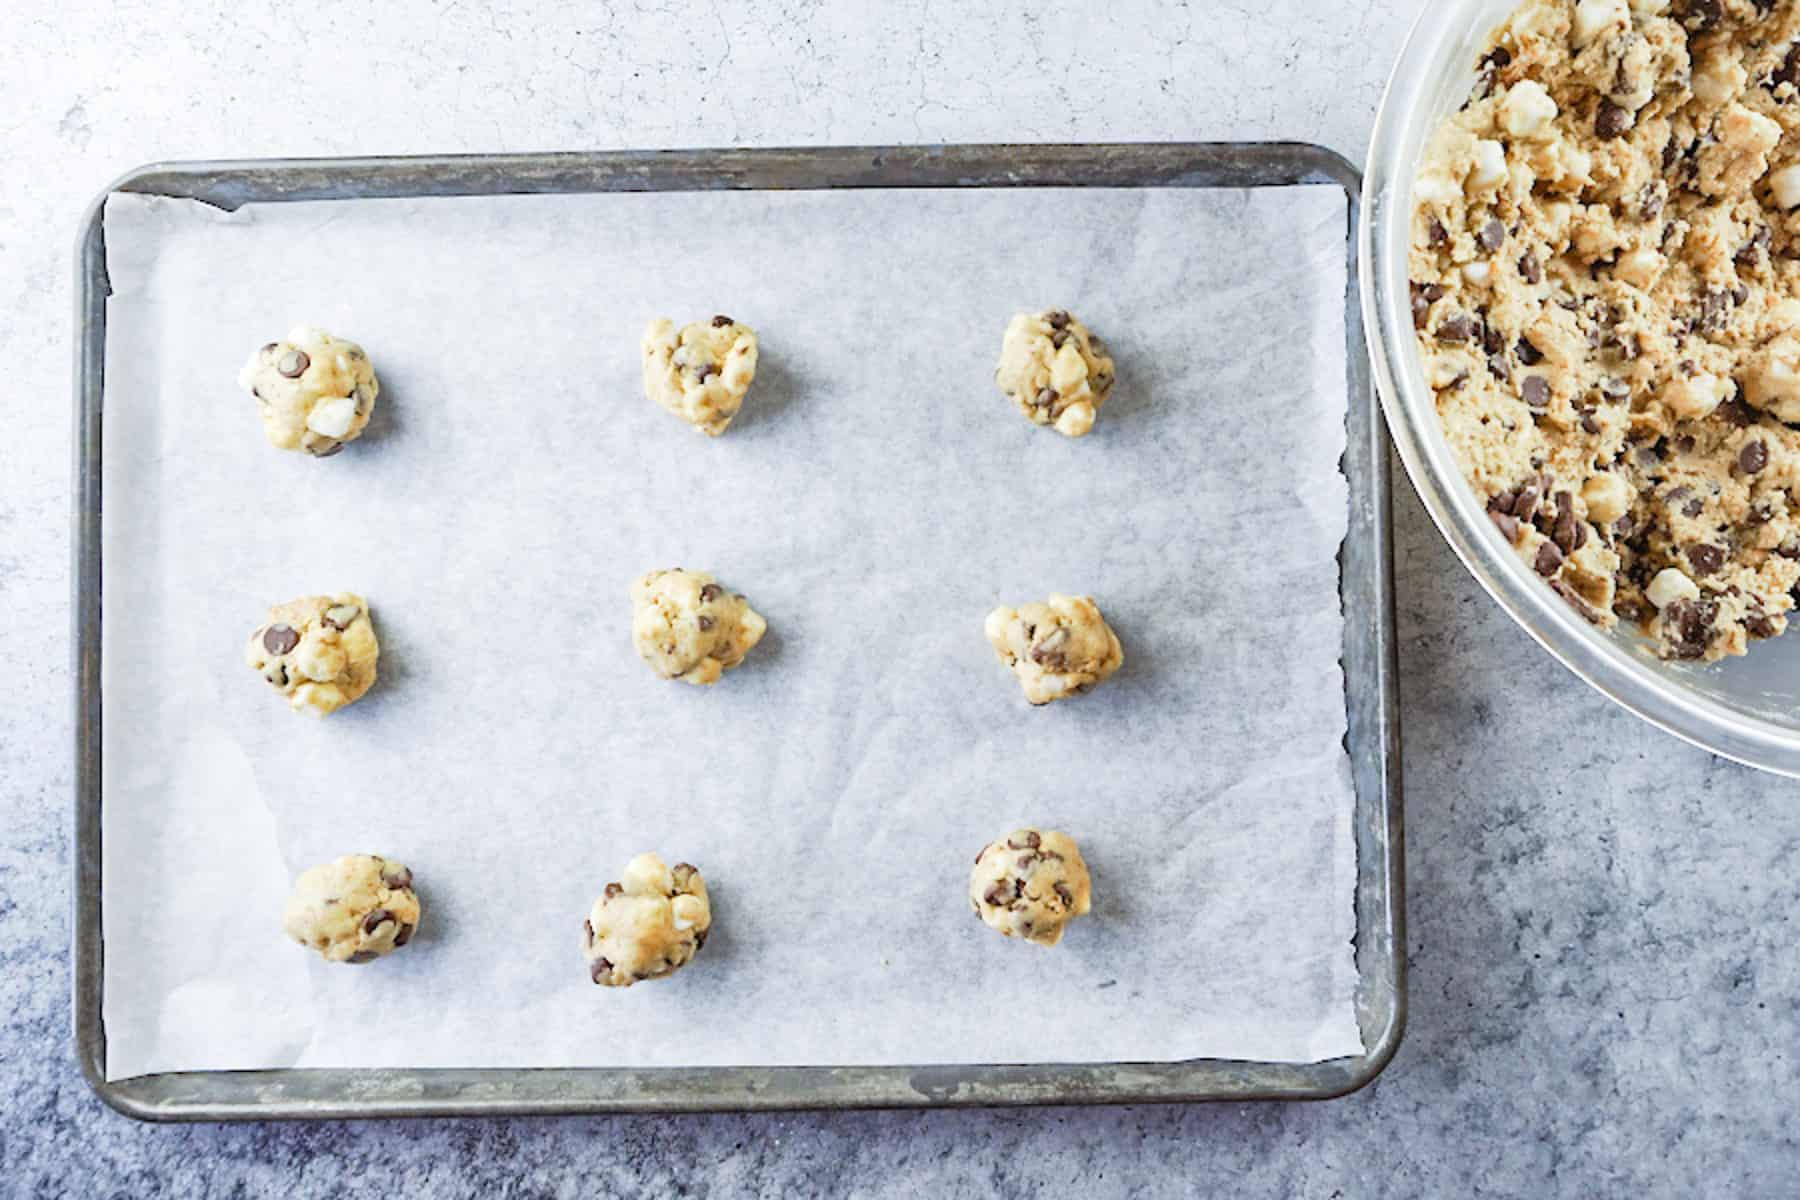 S'more cookies before baking on baking sheet